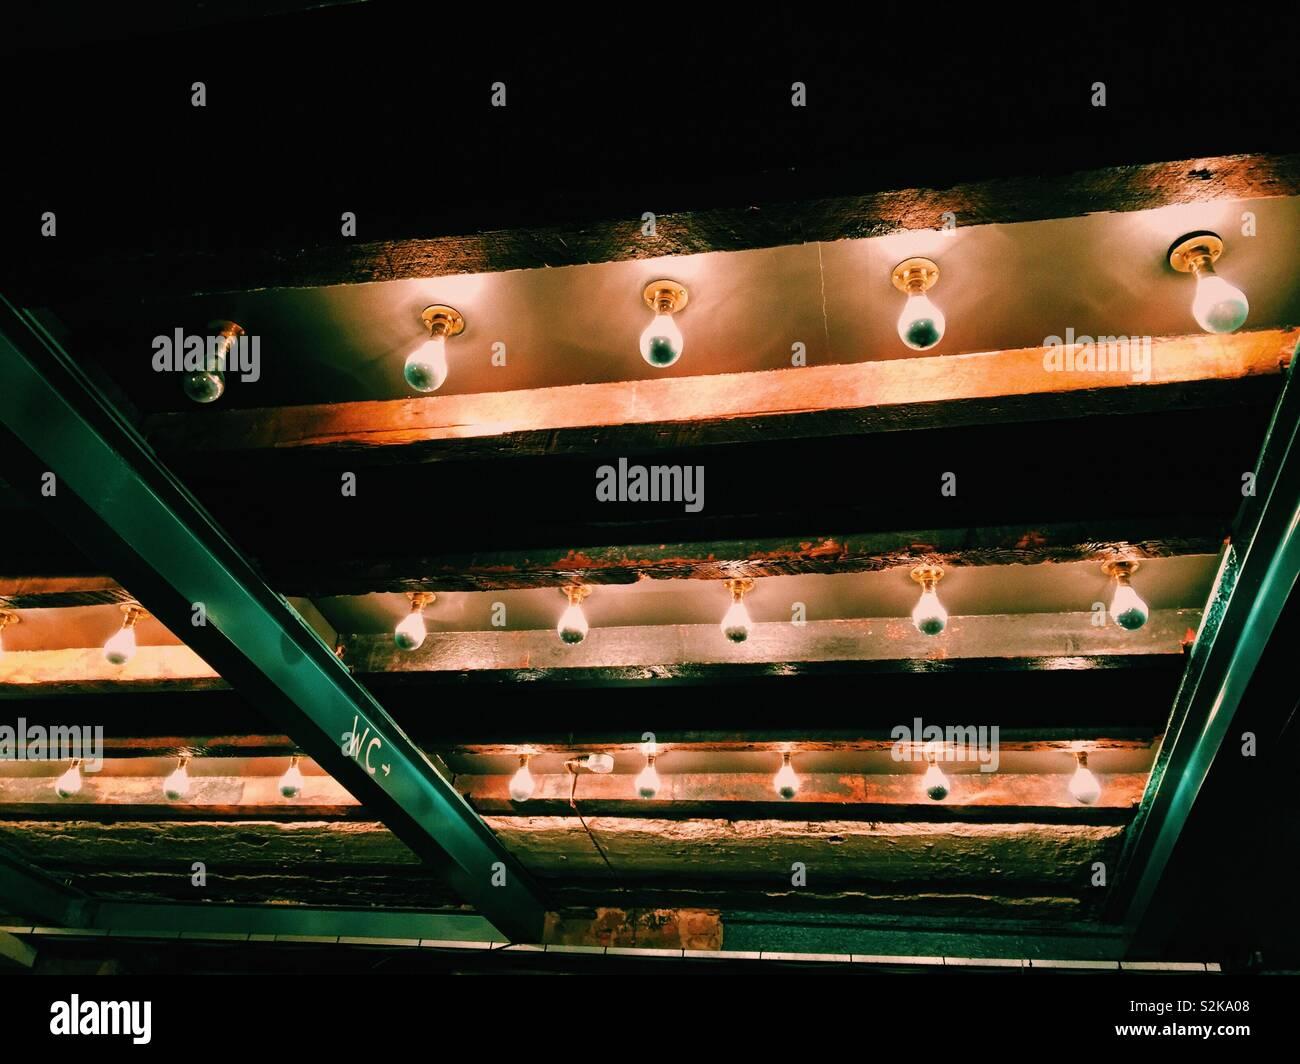 Techo con tiras de luces de bombilla desnuda en el bar restaurante. Luces de carnaval Imagen De Stock